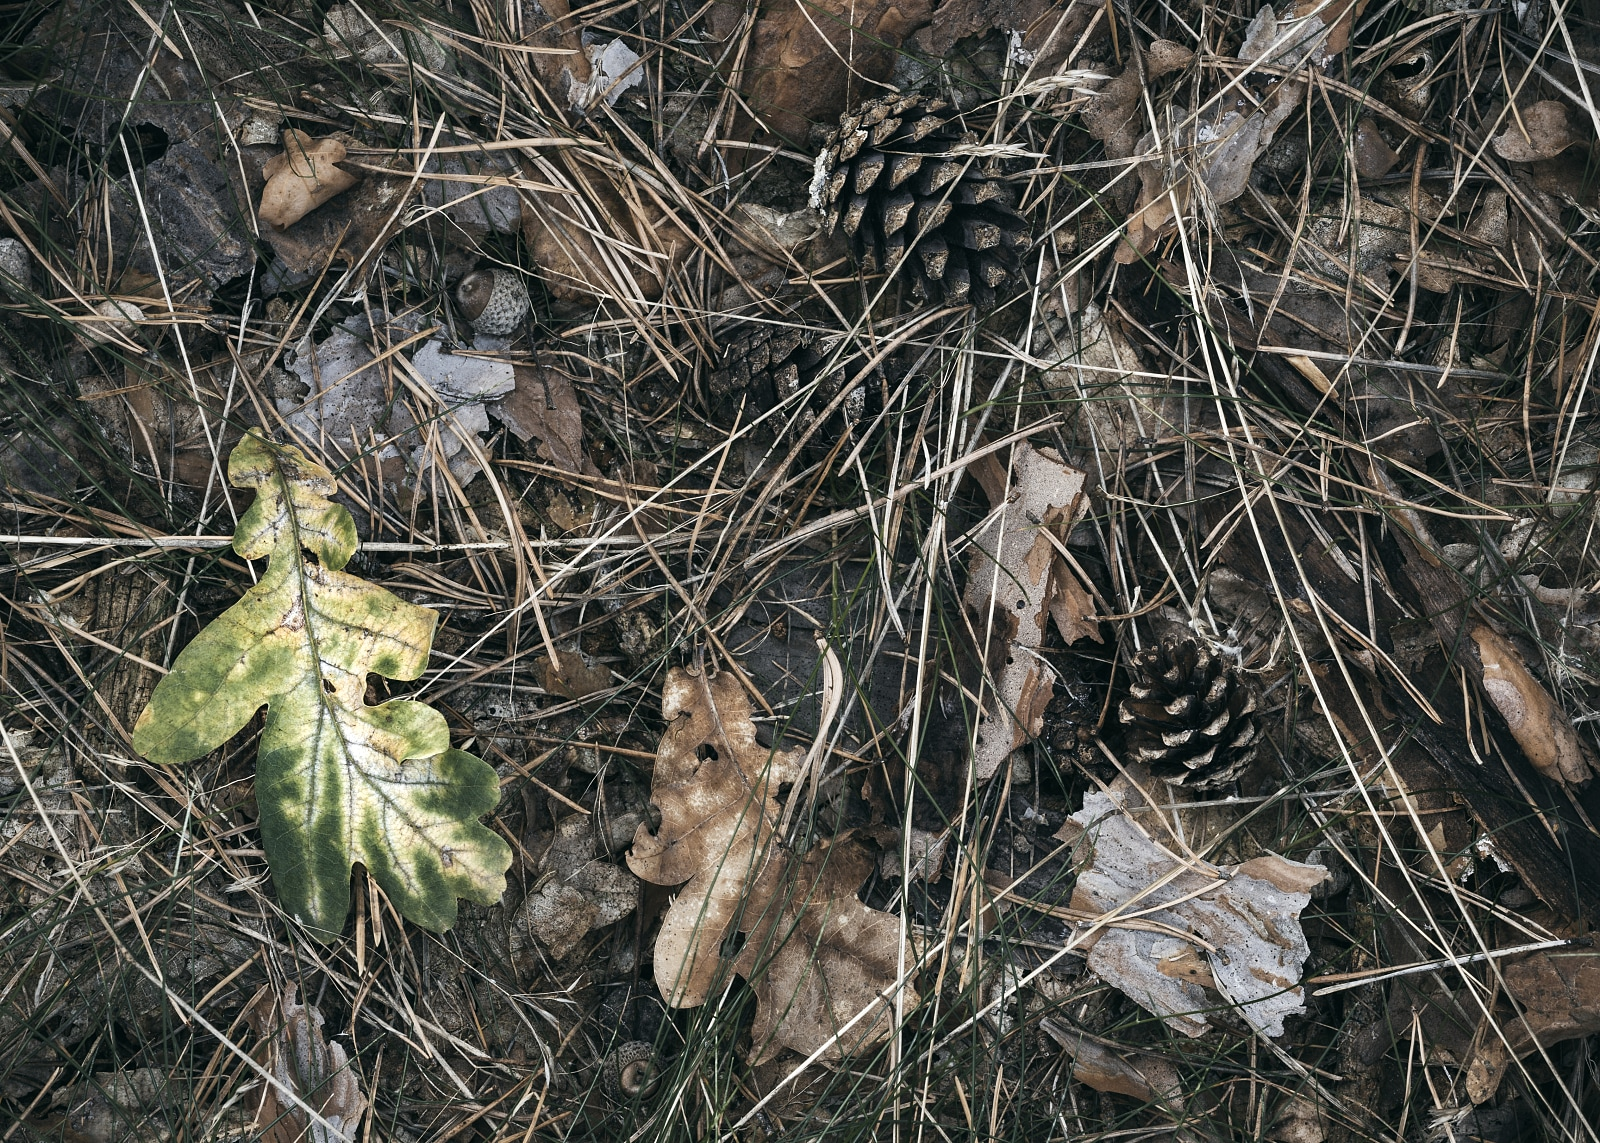 Oak leaf and cones